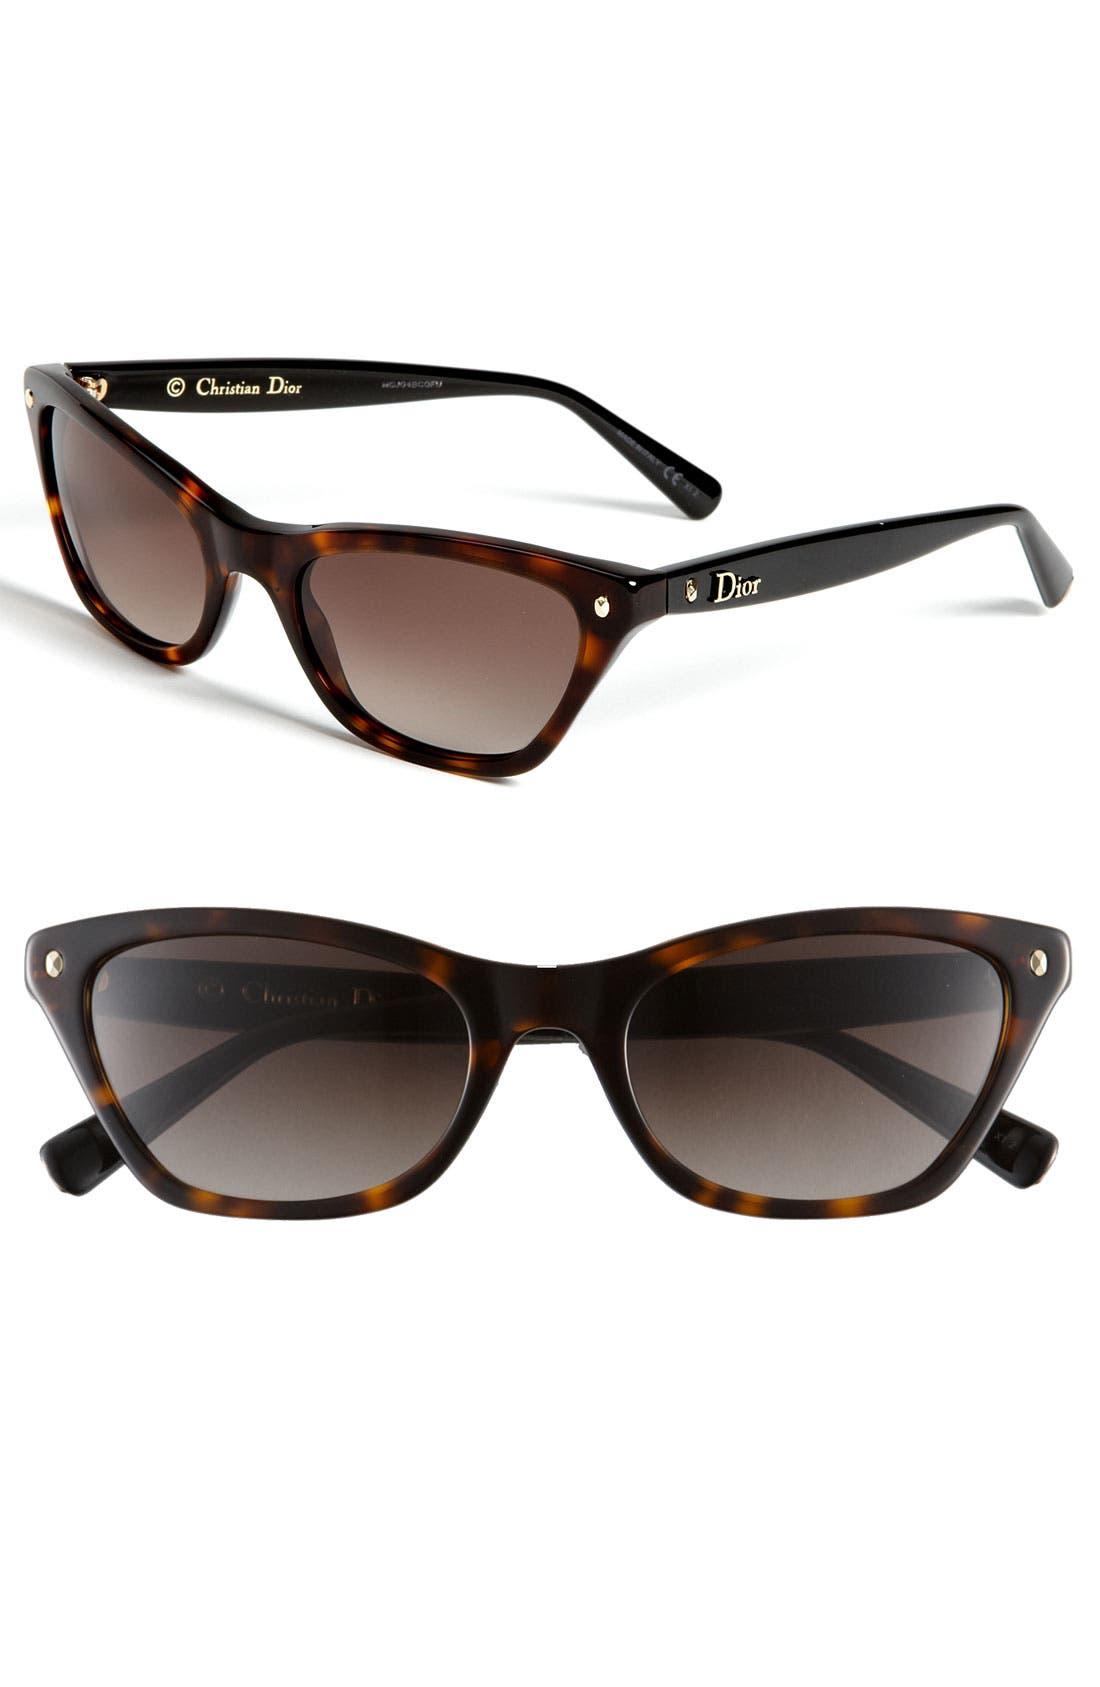 Alternate Image 1 Selected - Dior 'Hatutaa' Sunglasses